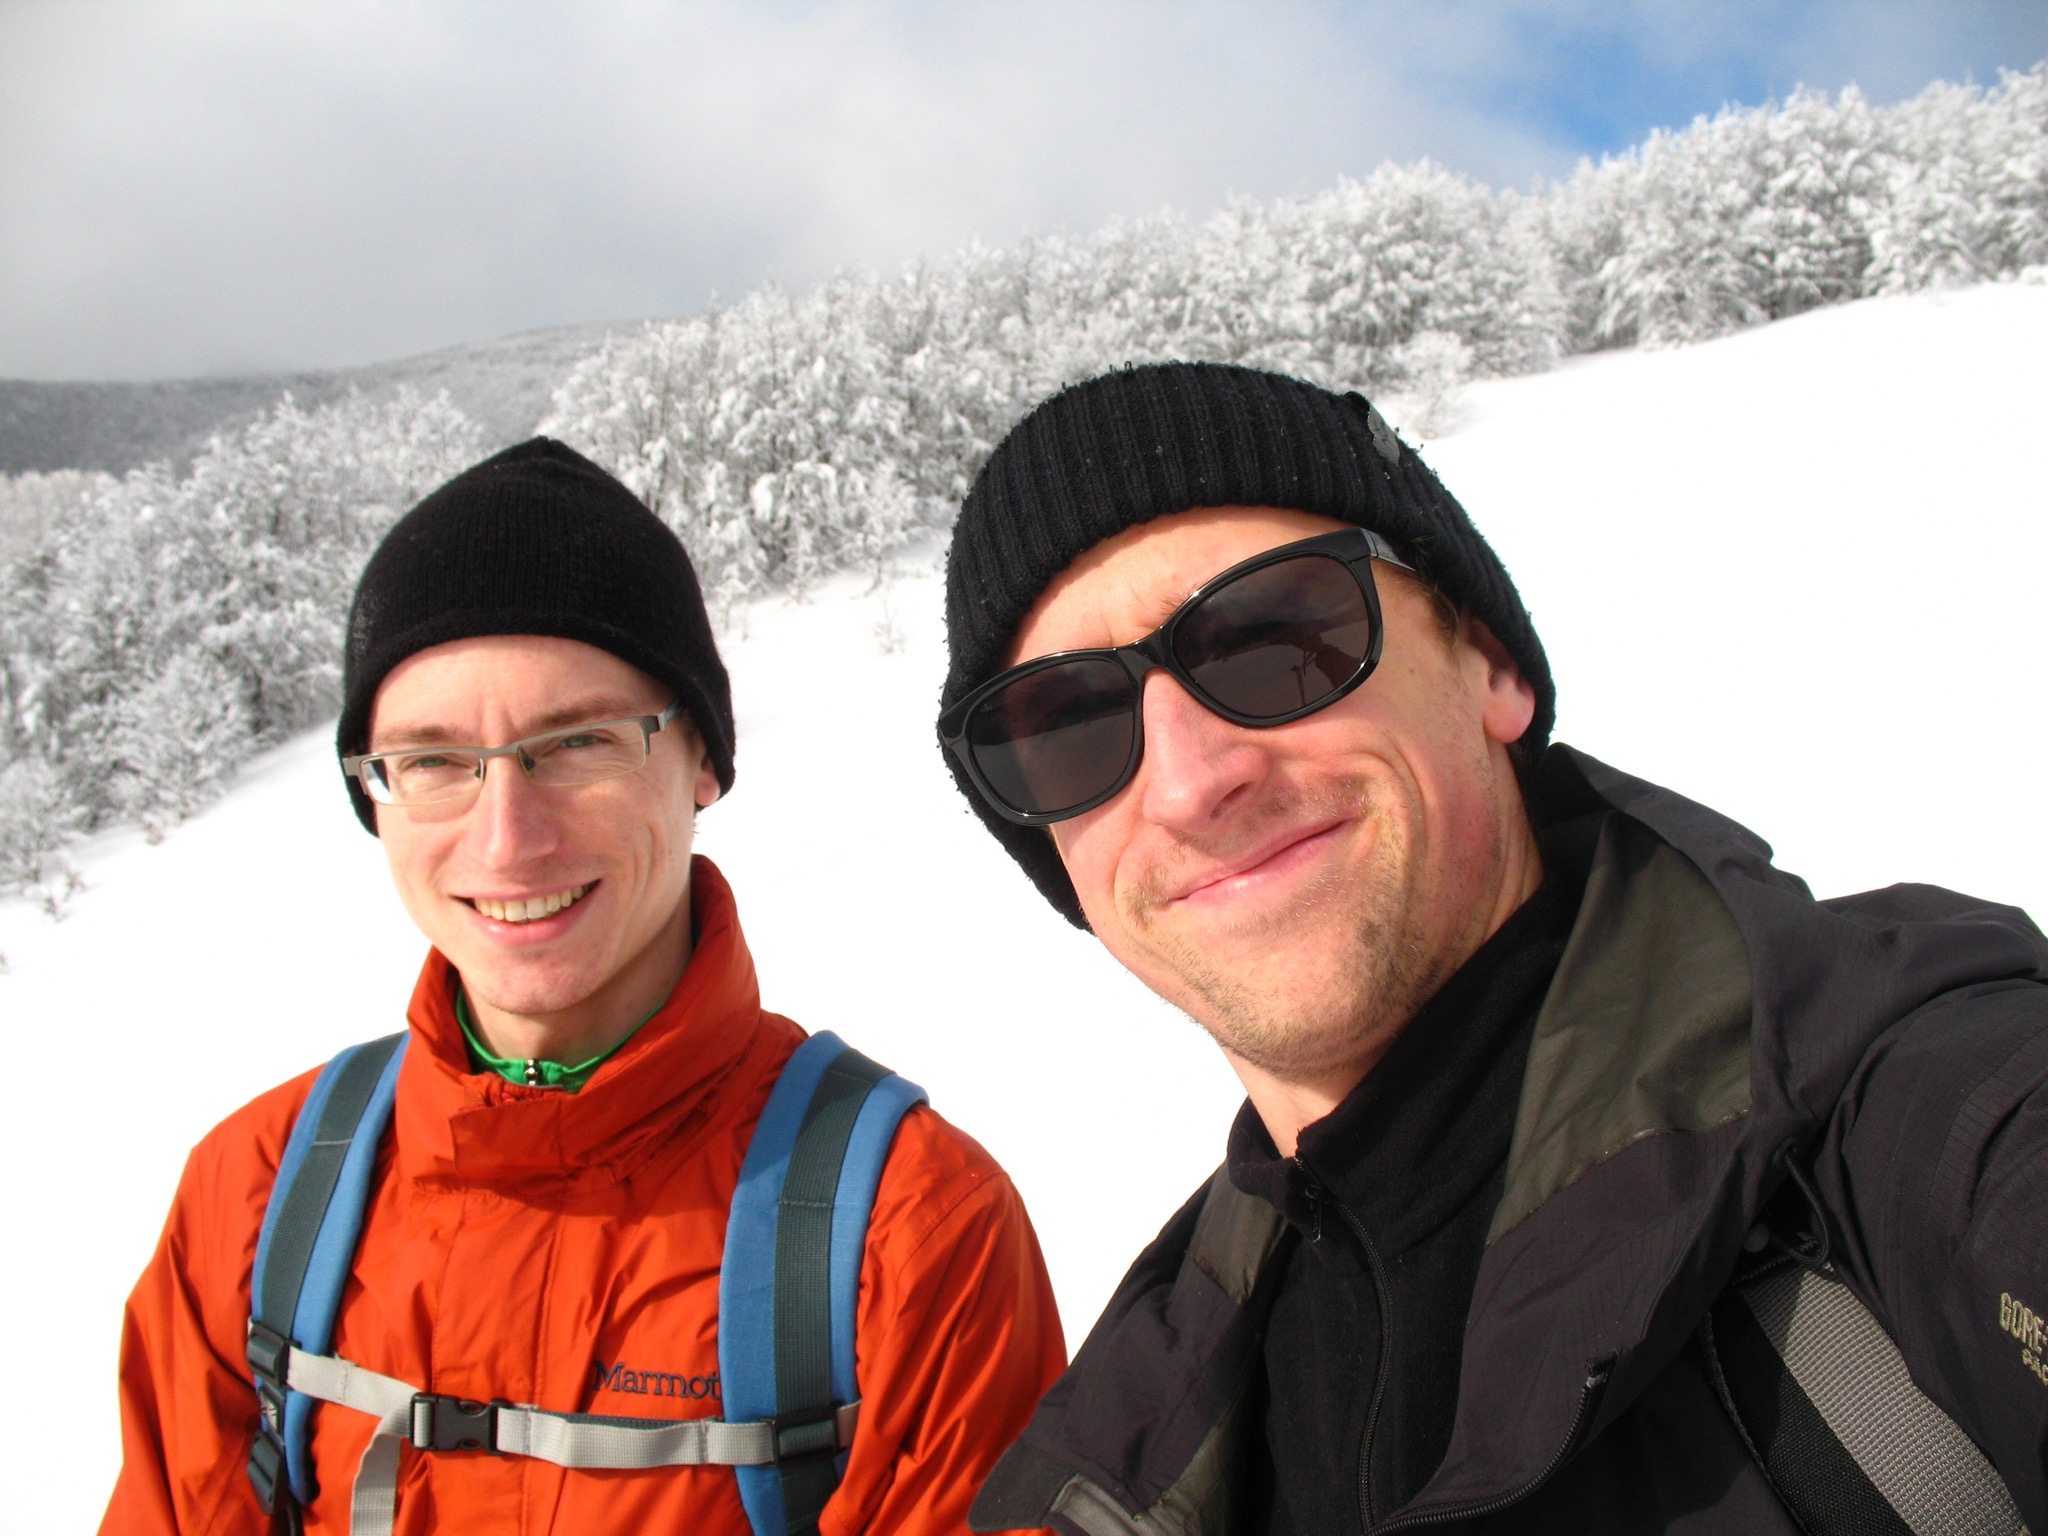 San Pellegrino in Neve